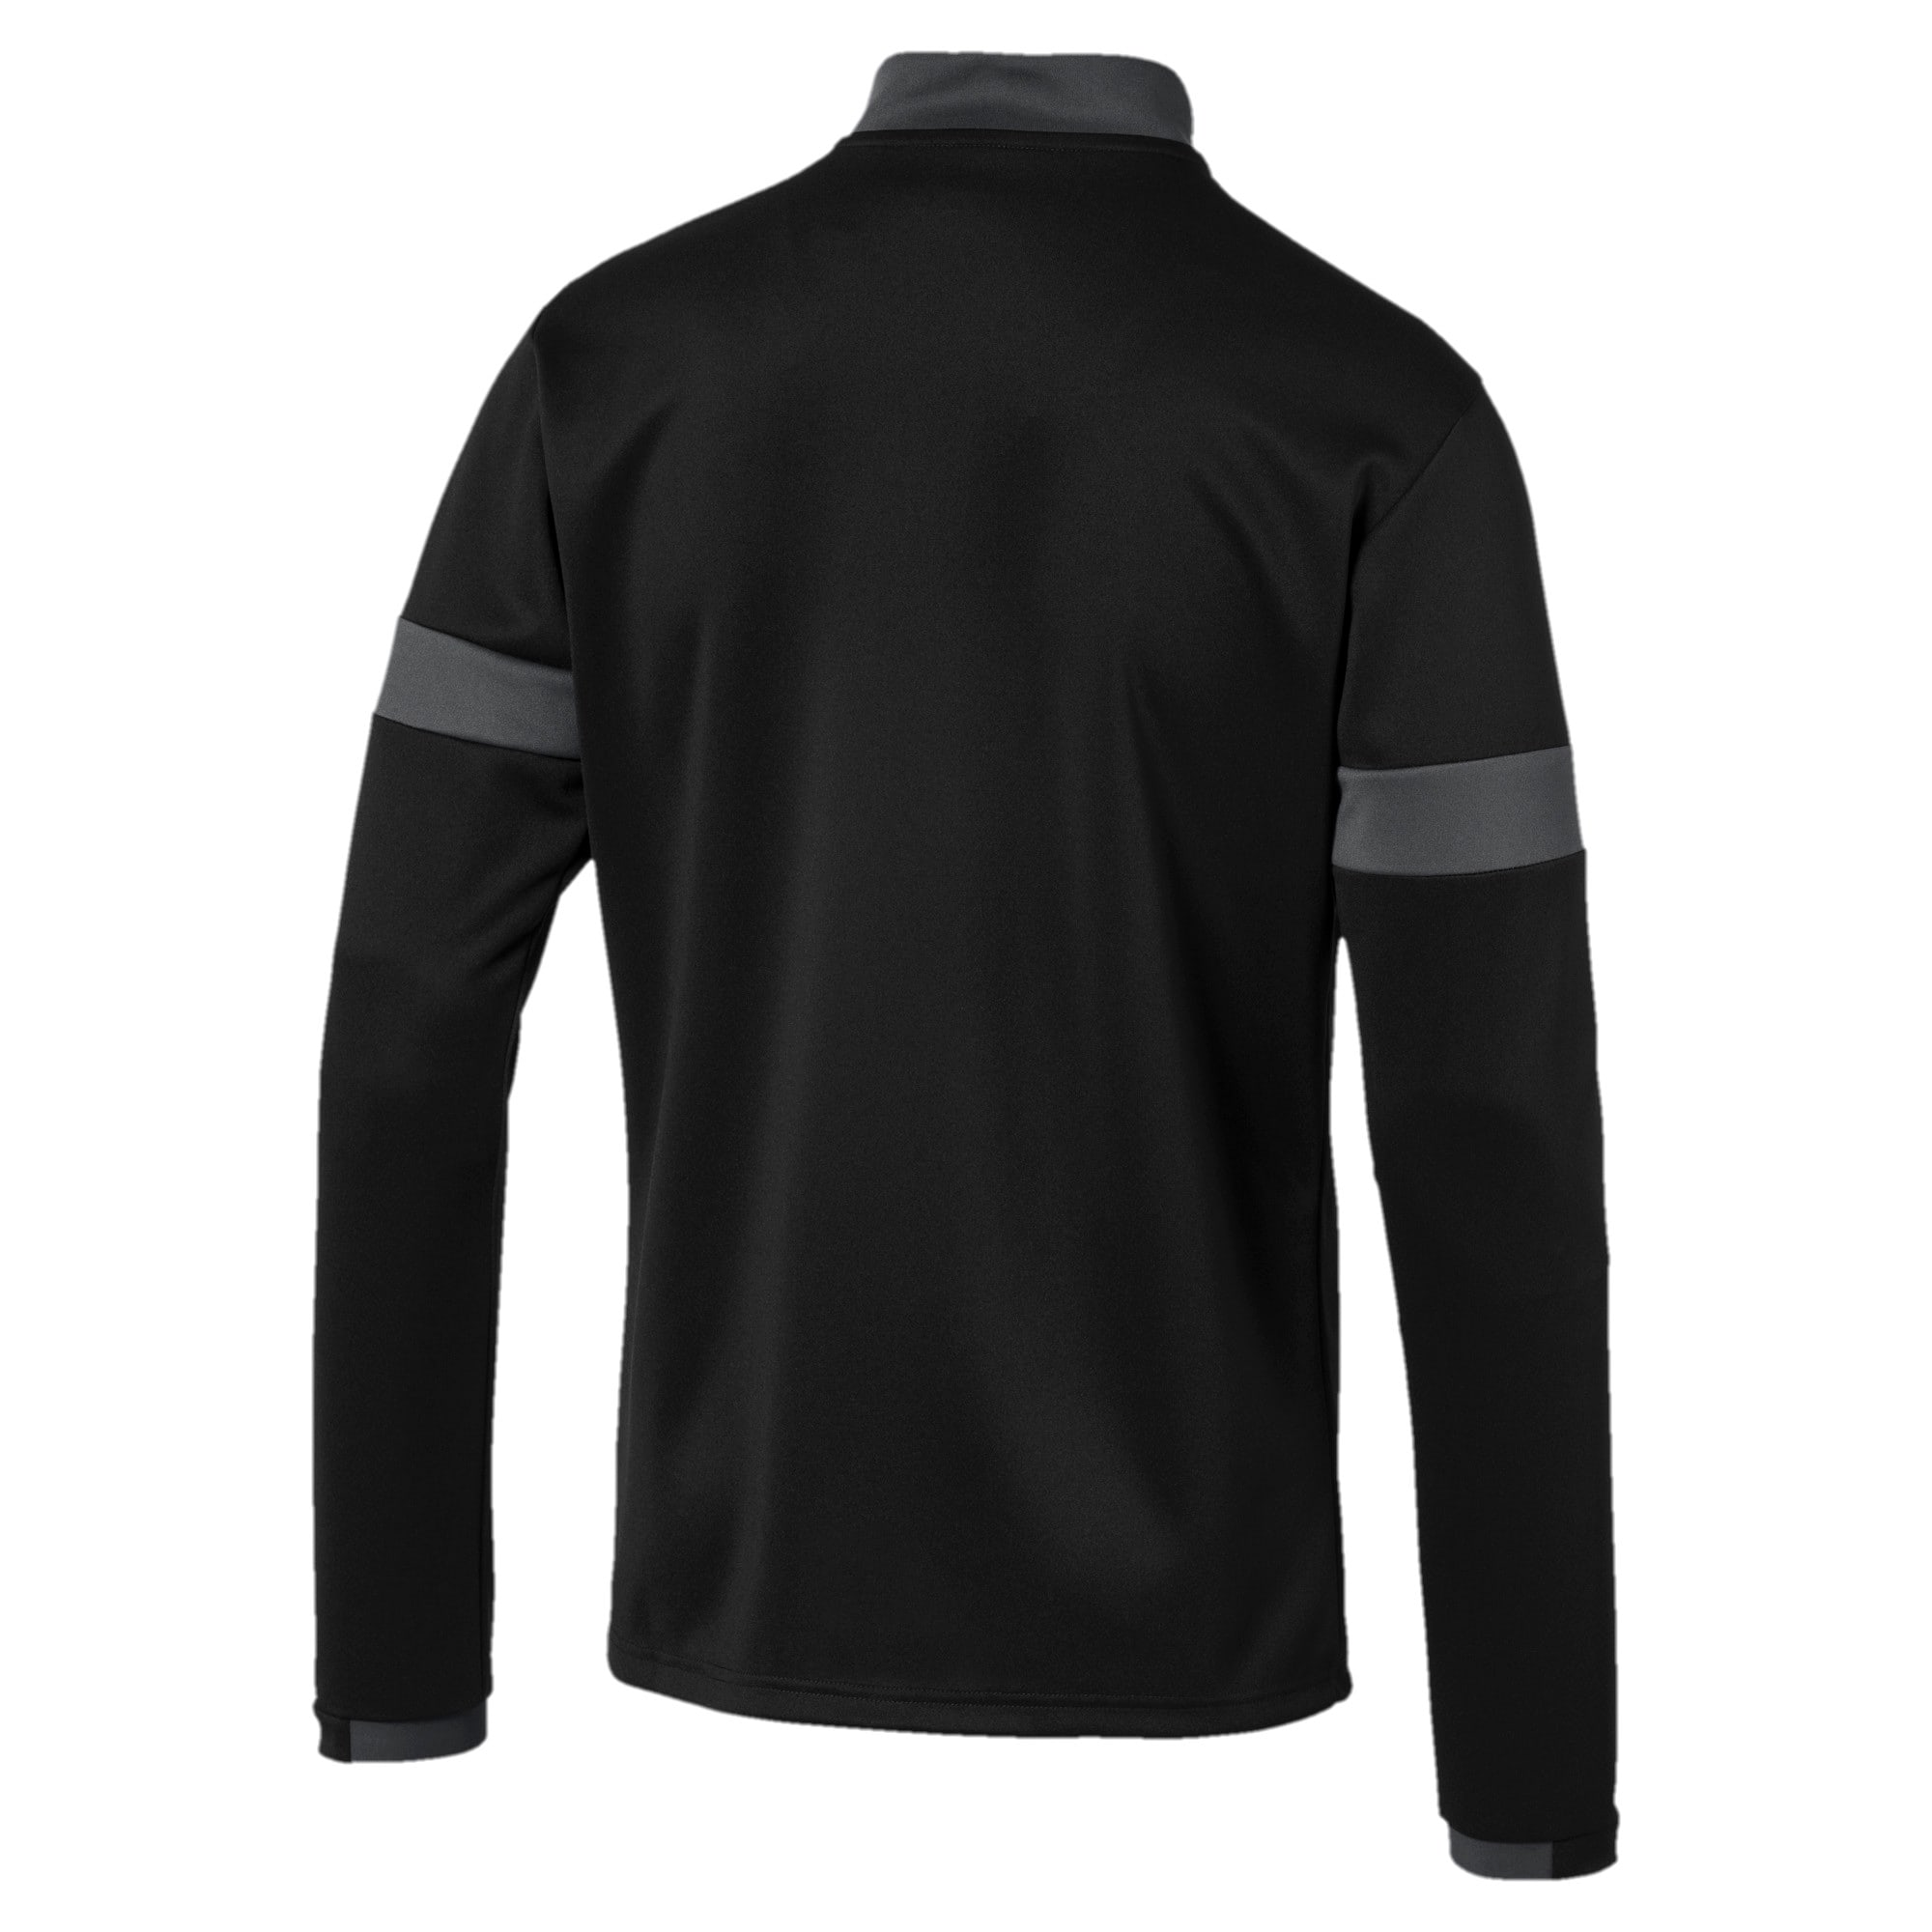 Thumbnail 5 of Sweatshirt pour homme, Puma Black-Asphalt, medium